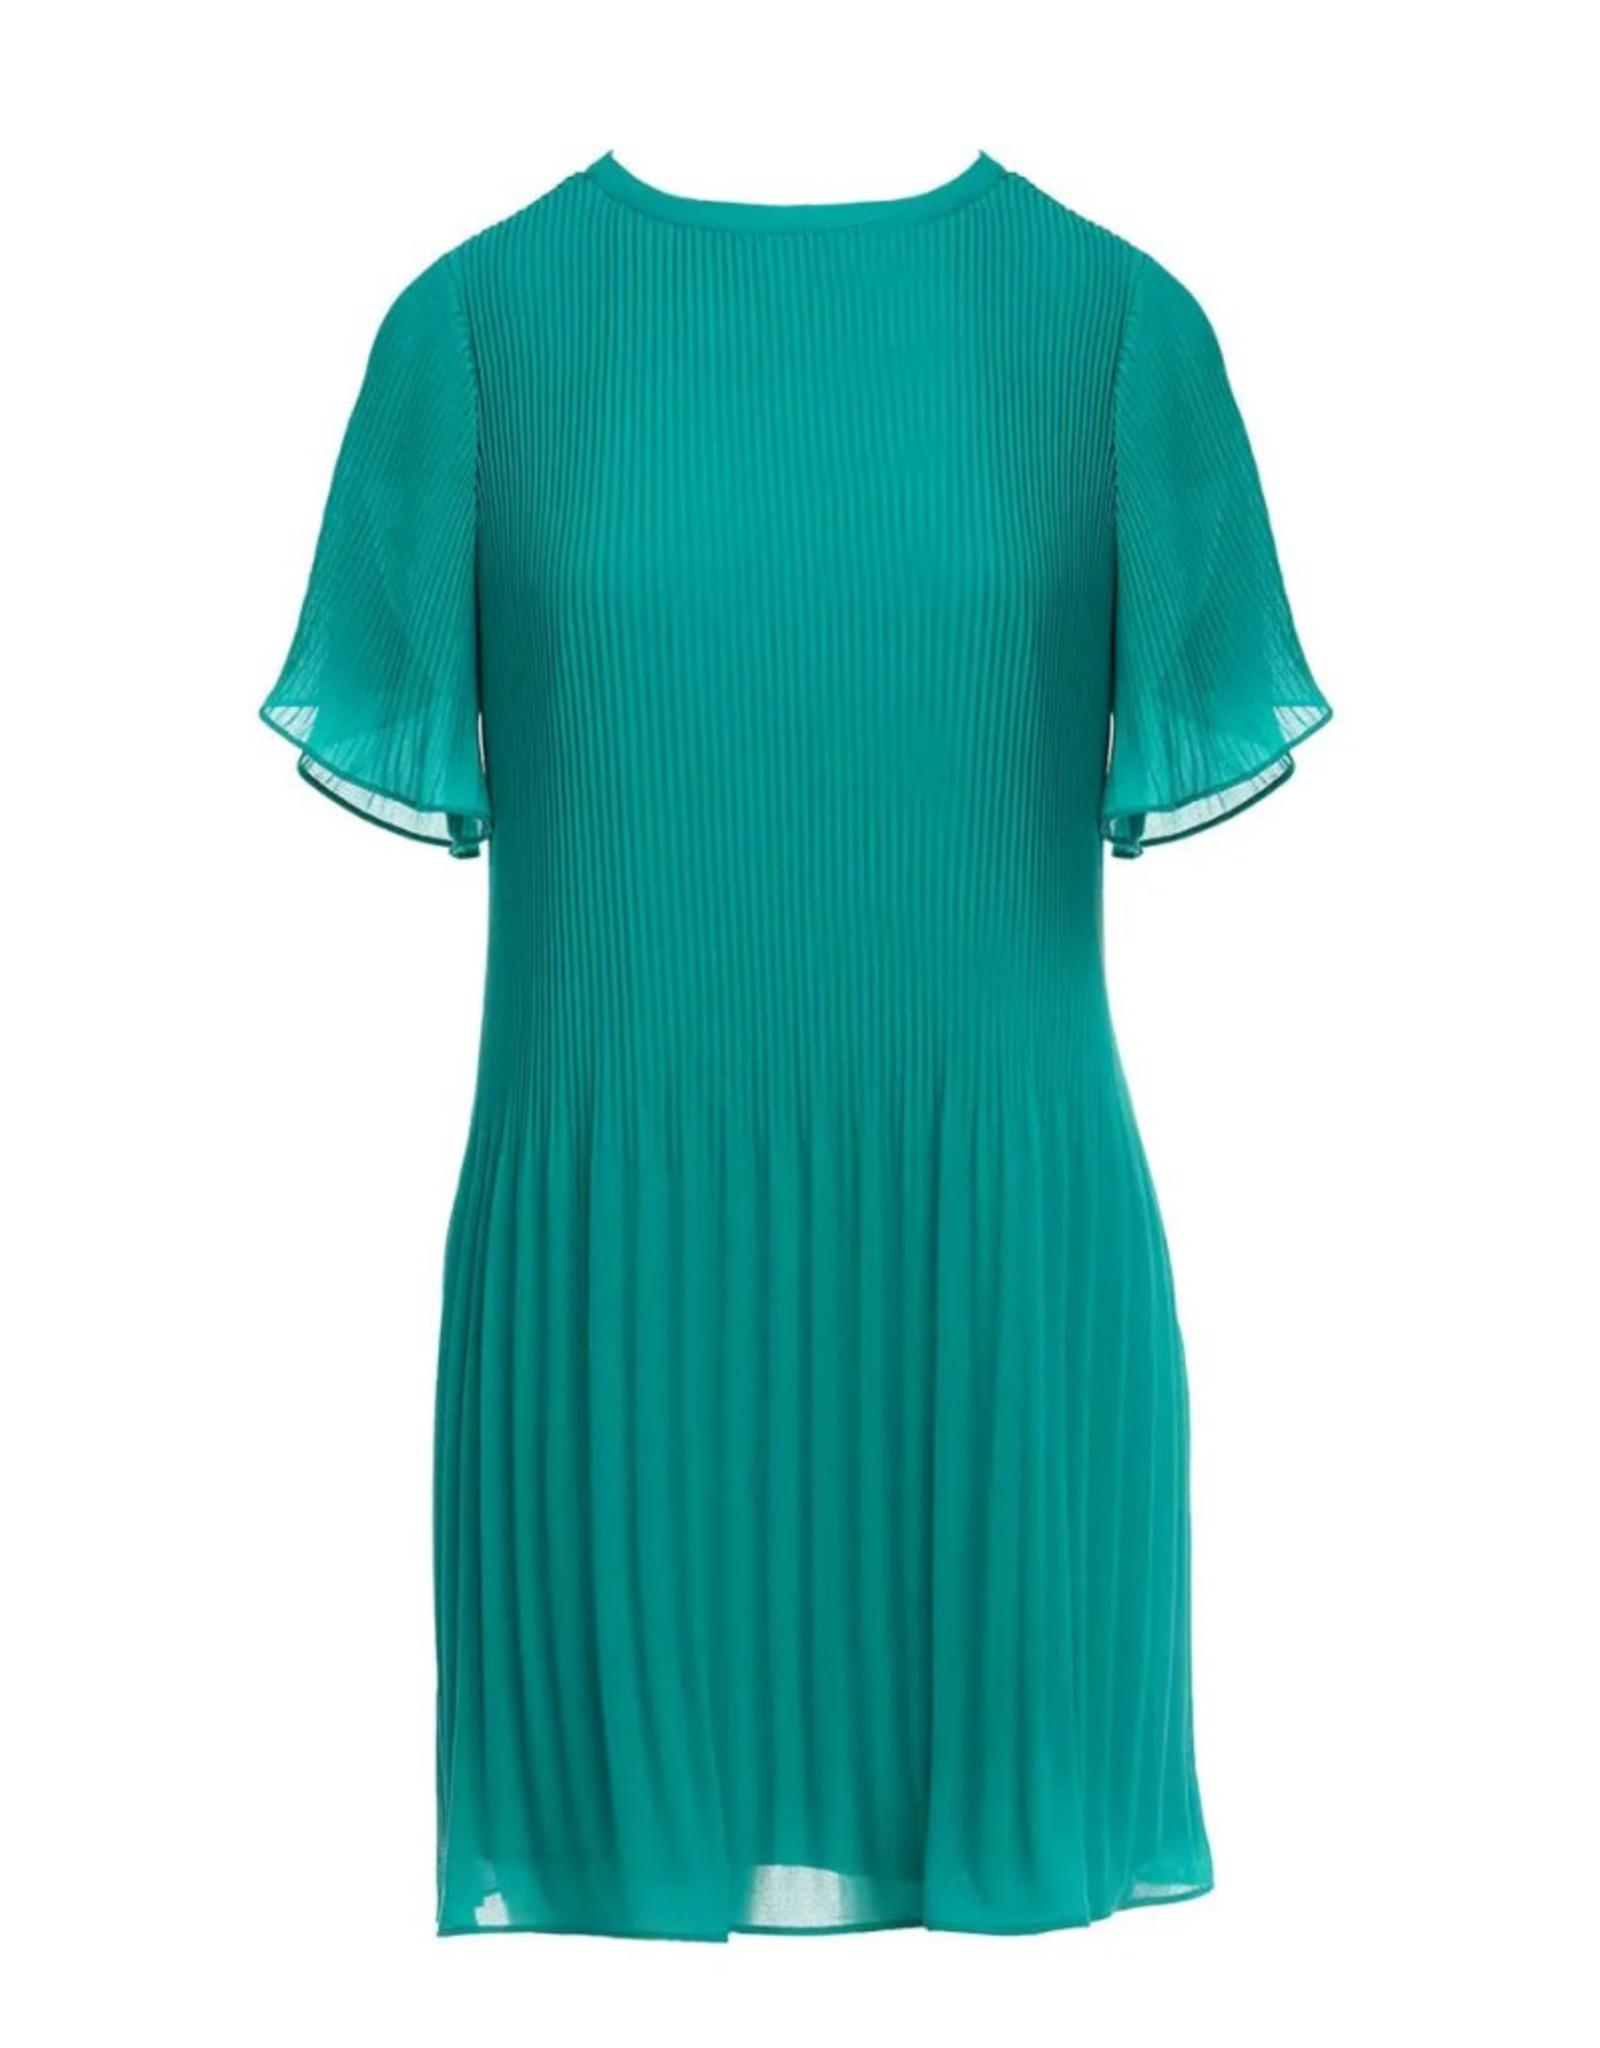 Short Sleeve Pleated Mini Dress - Spectra Green